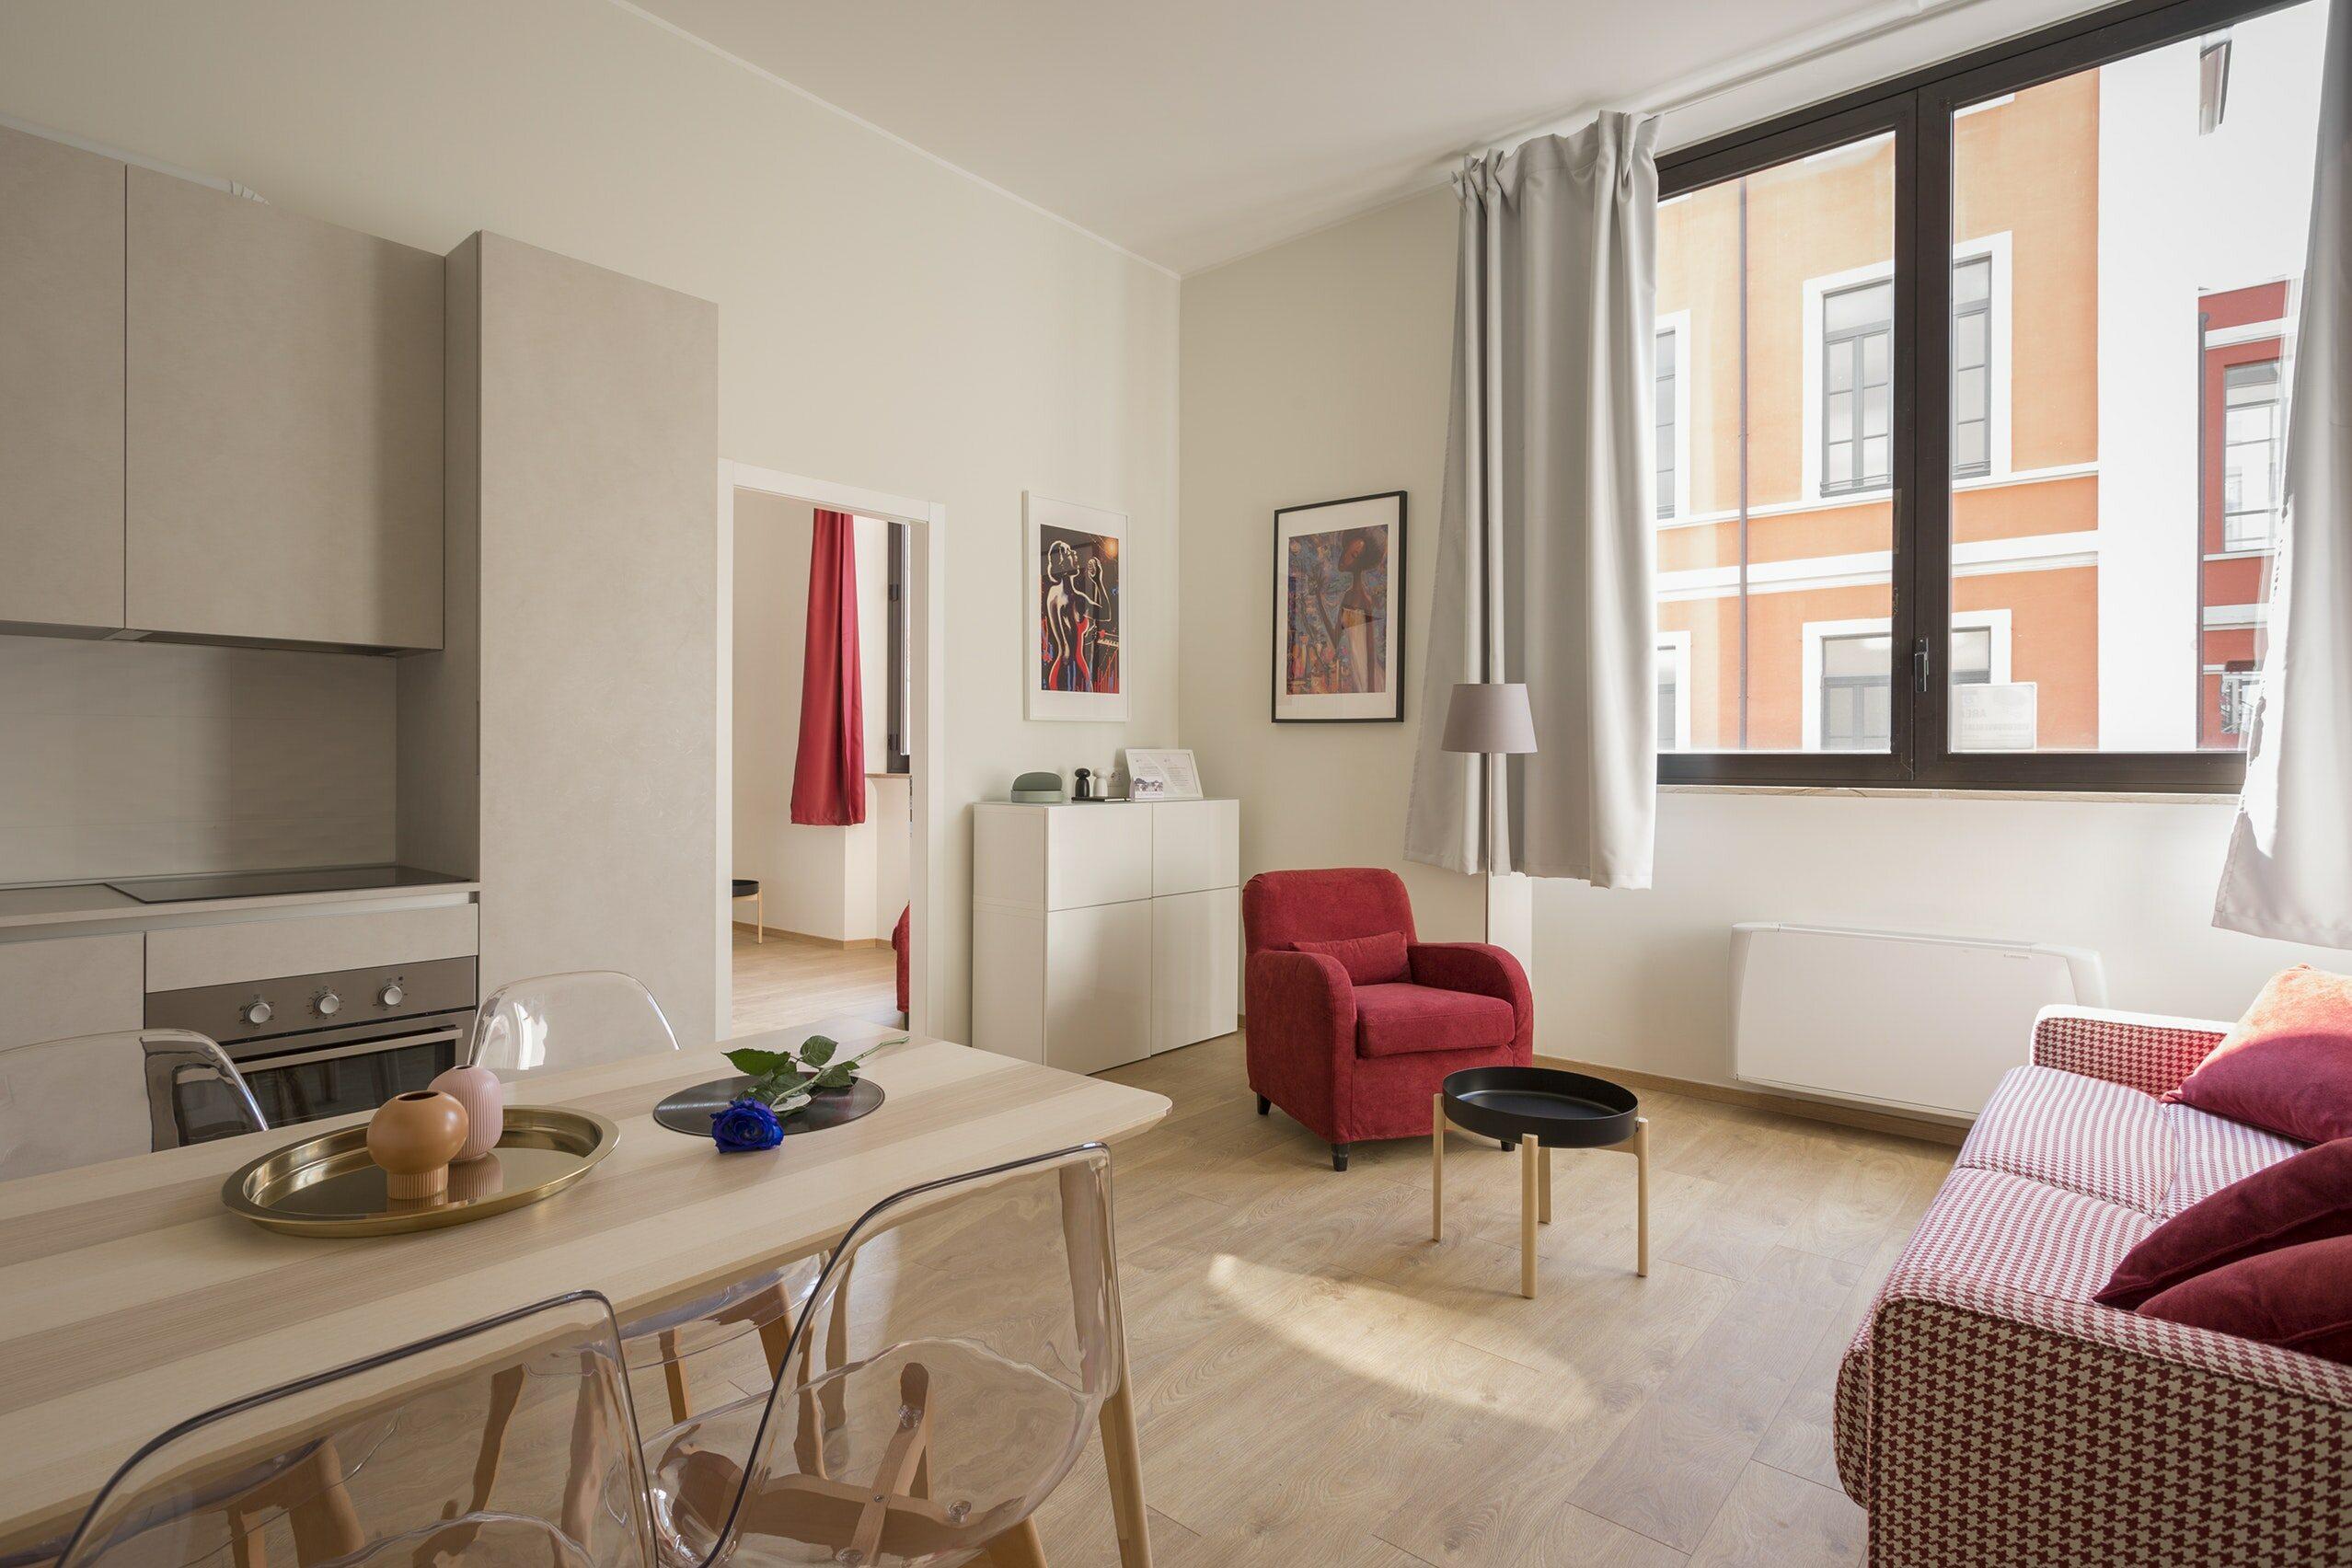 Ceny mieszkań rosną